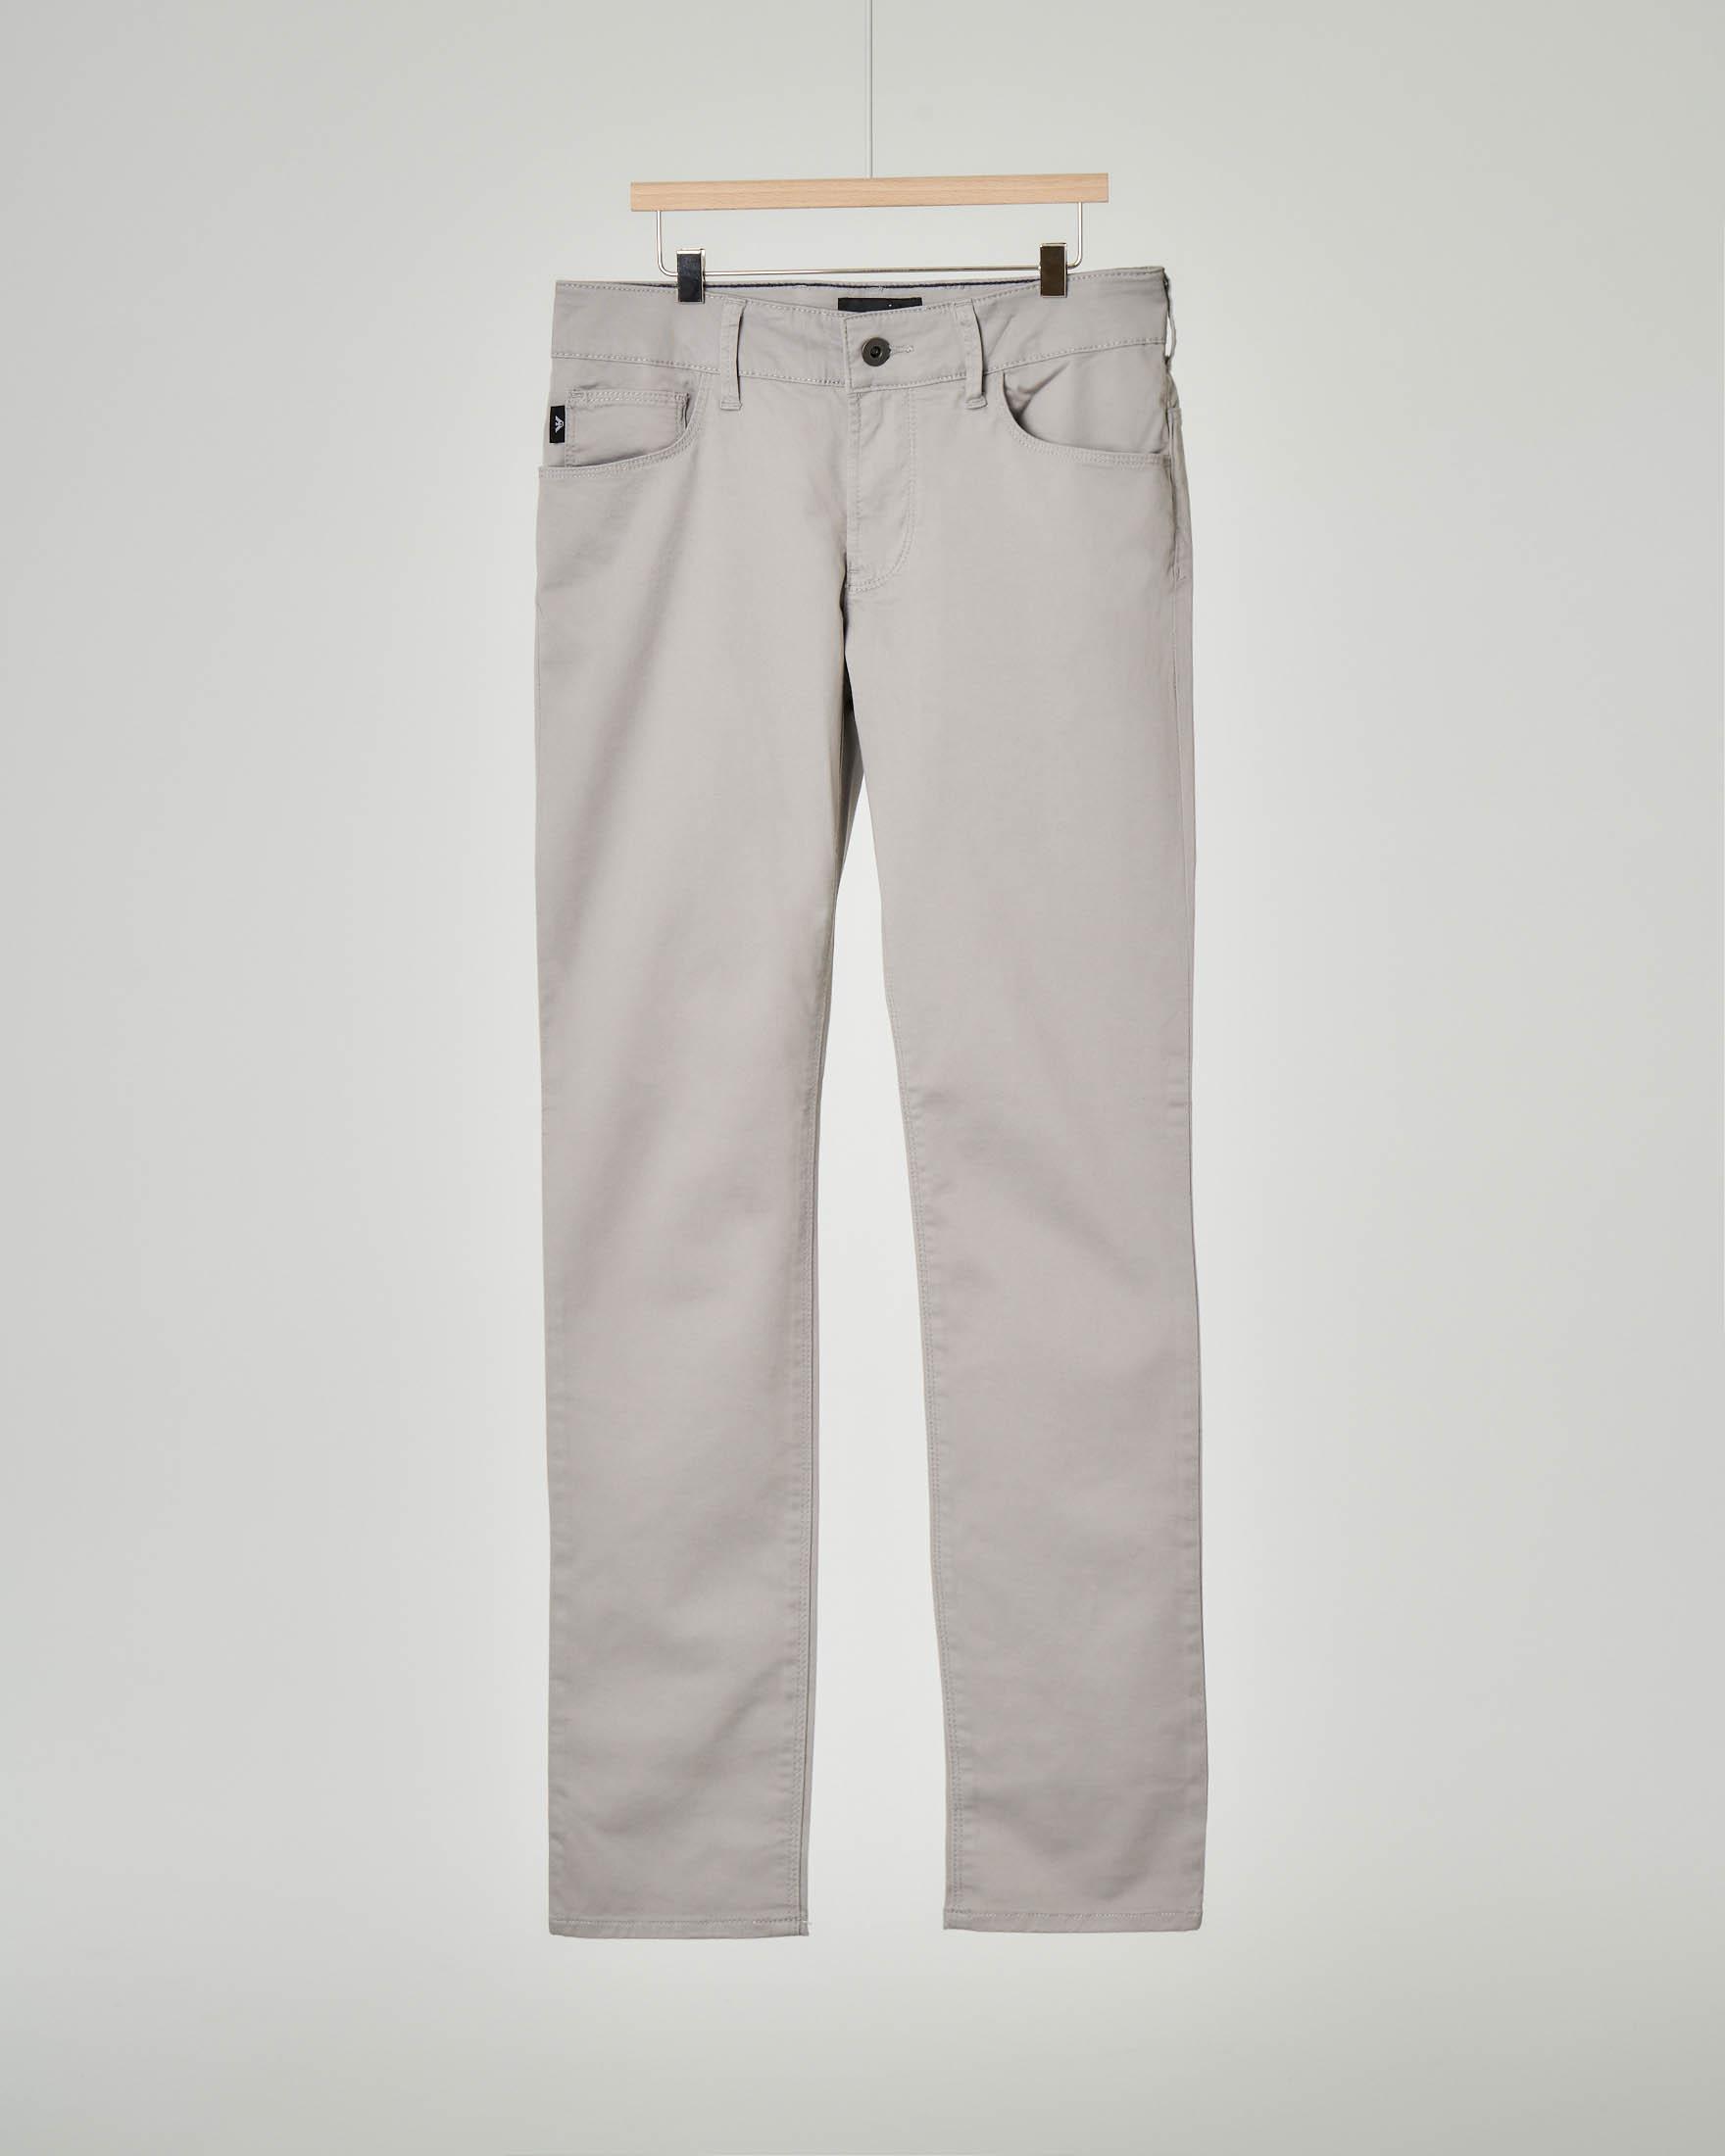 Pantalone grigio cinque tasche